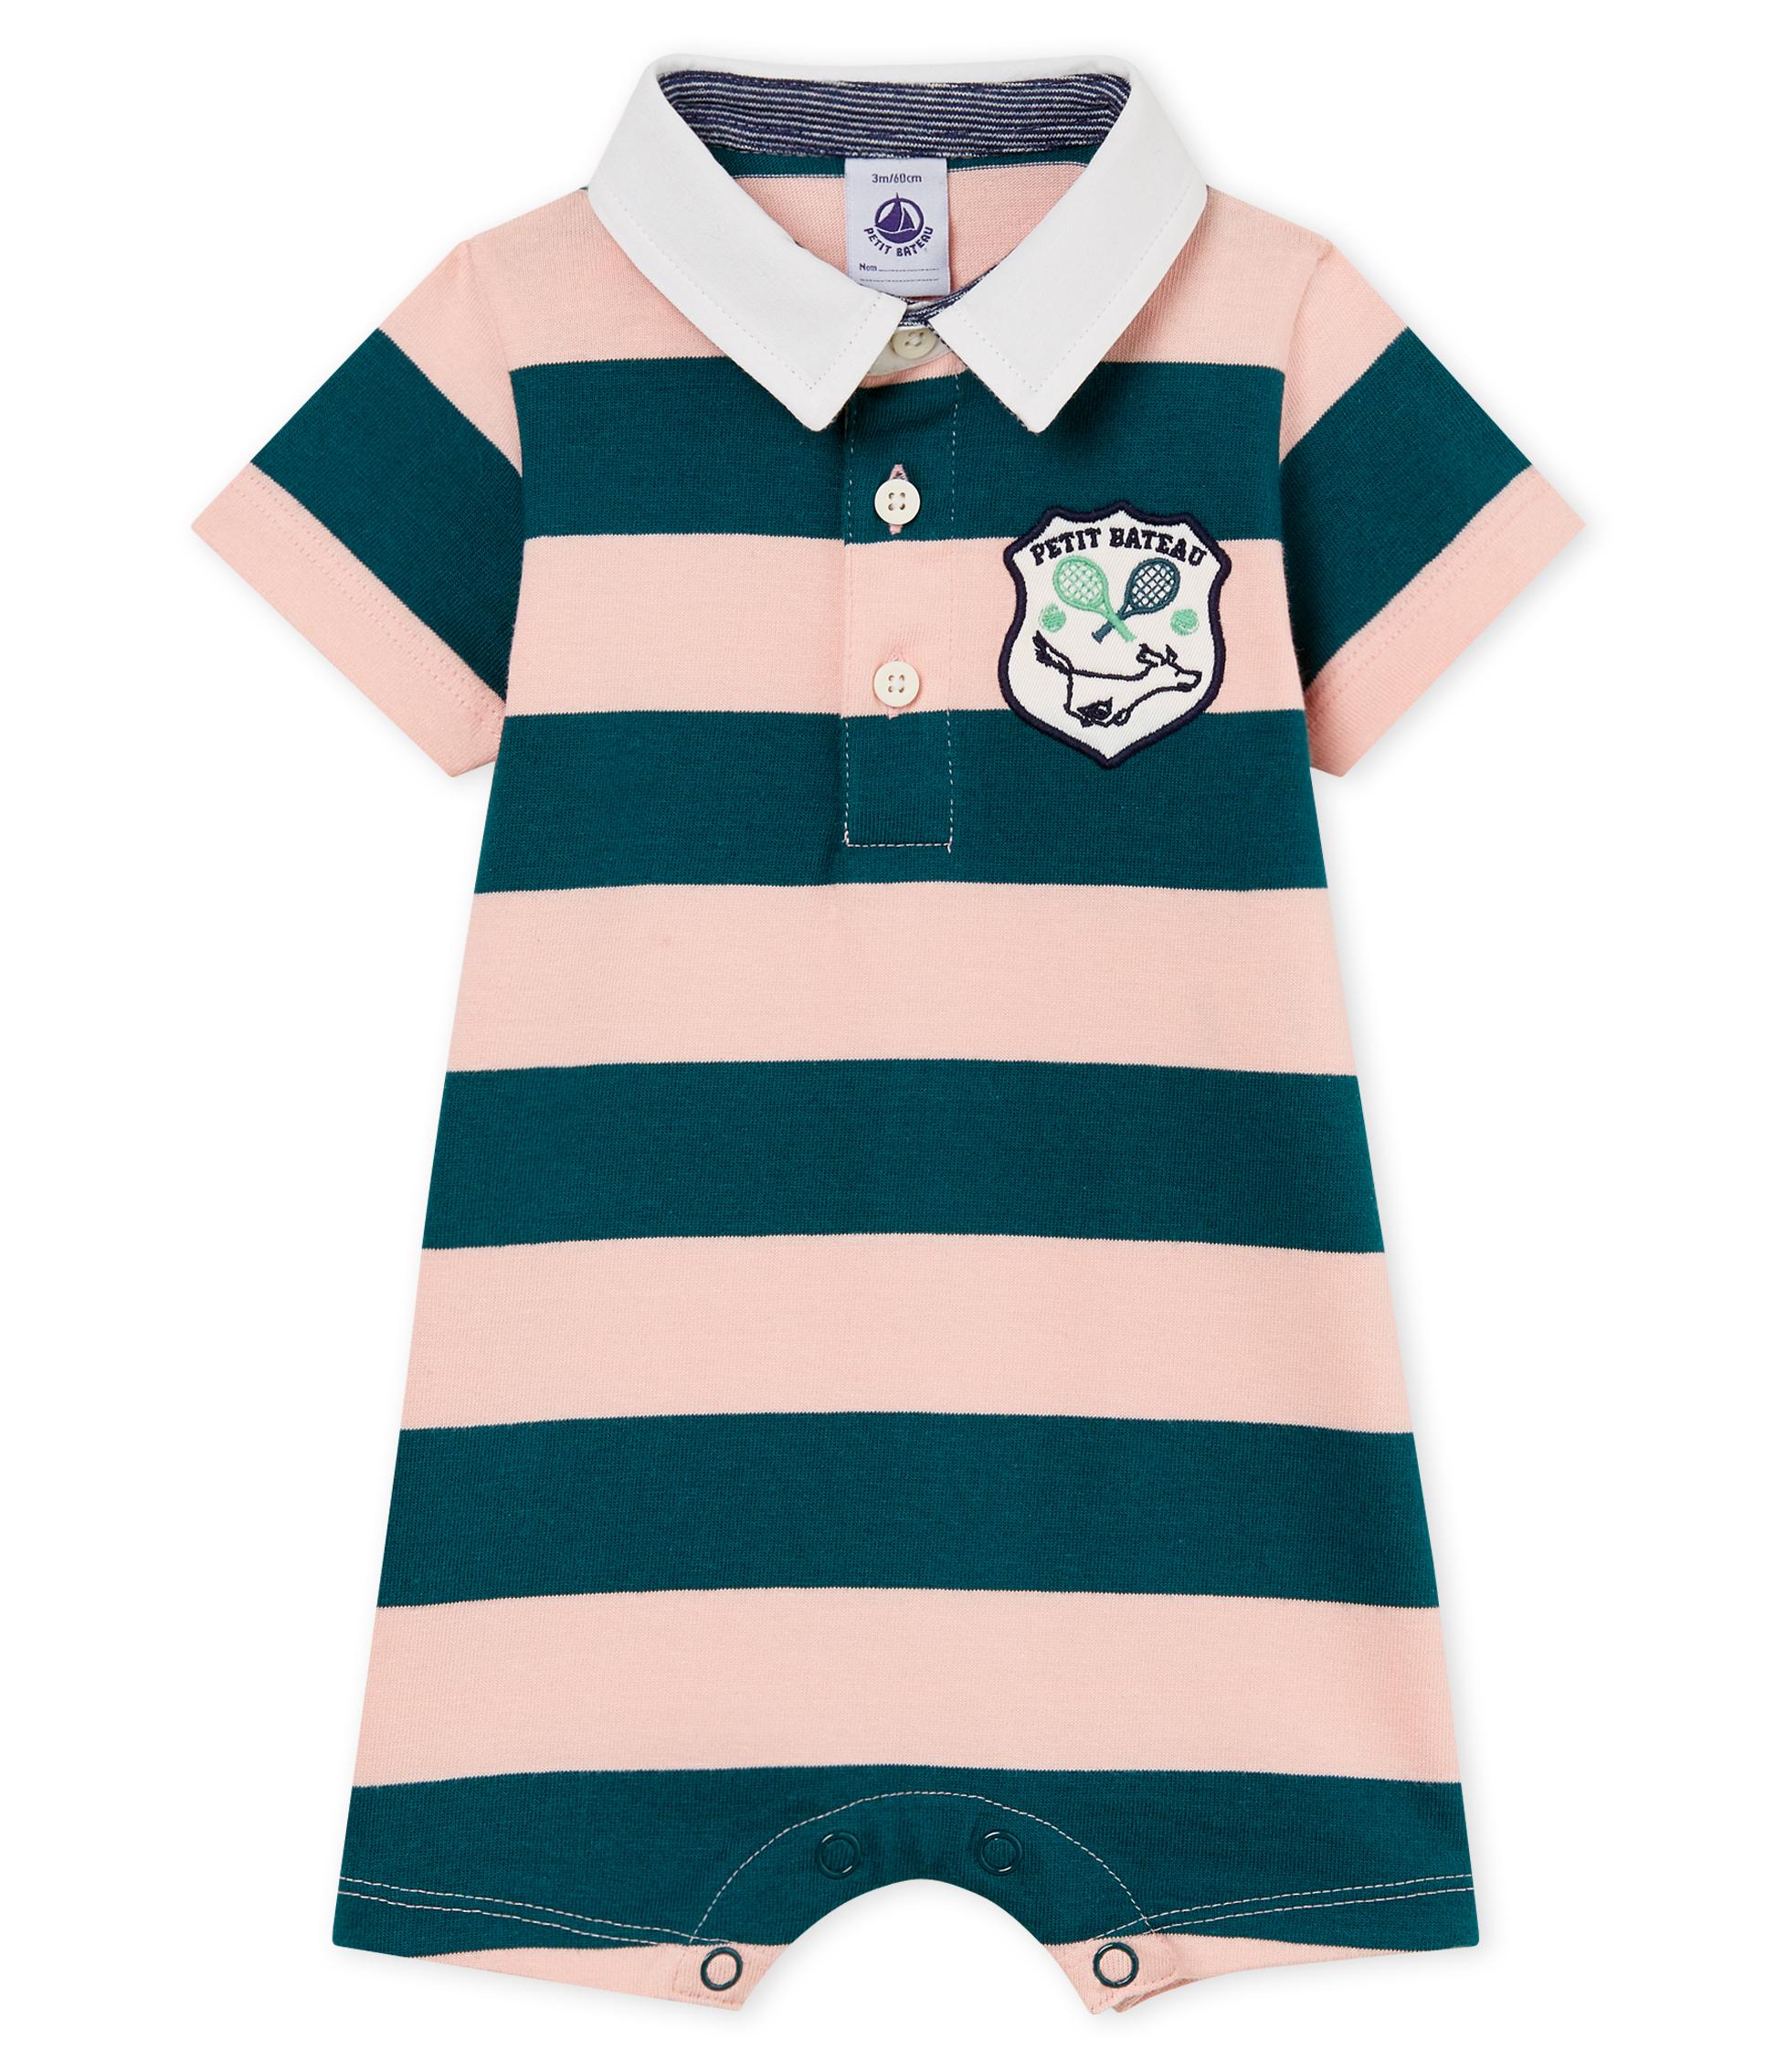 49b62ed08 Baby boys' striped polo shirt Shortie | Petit Bateau